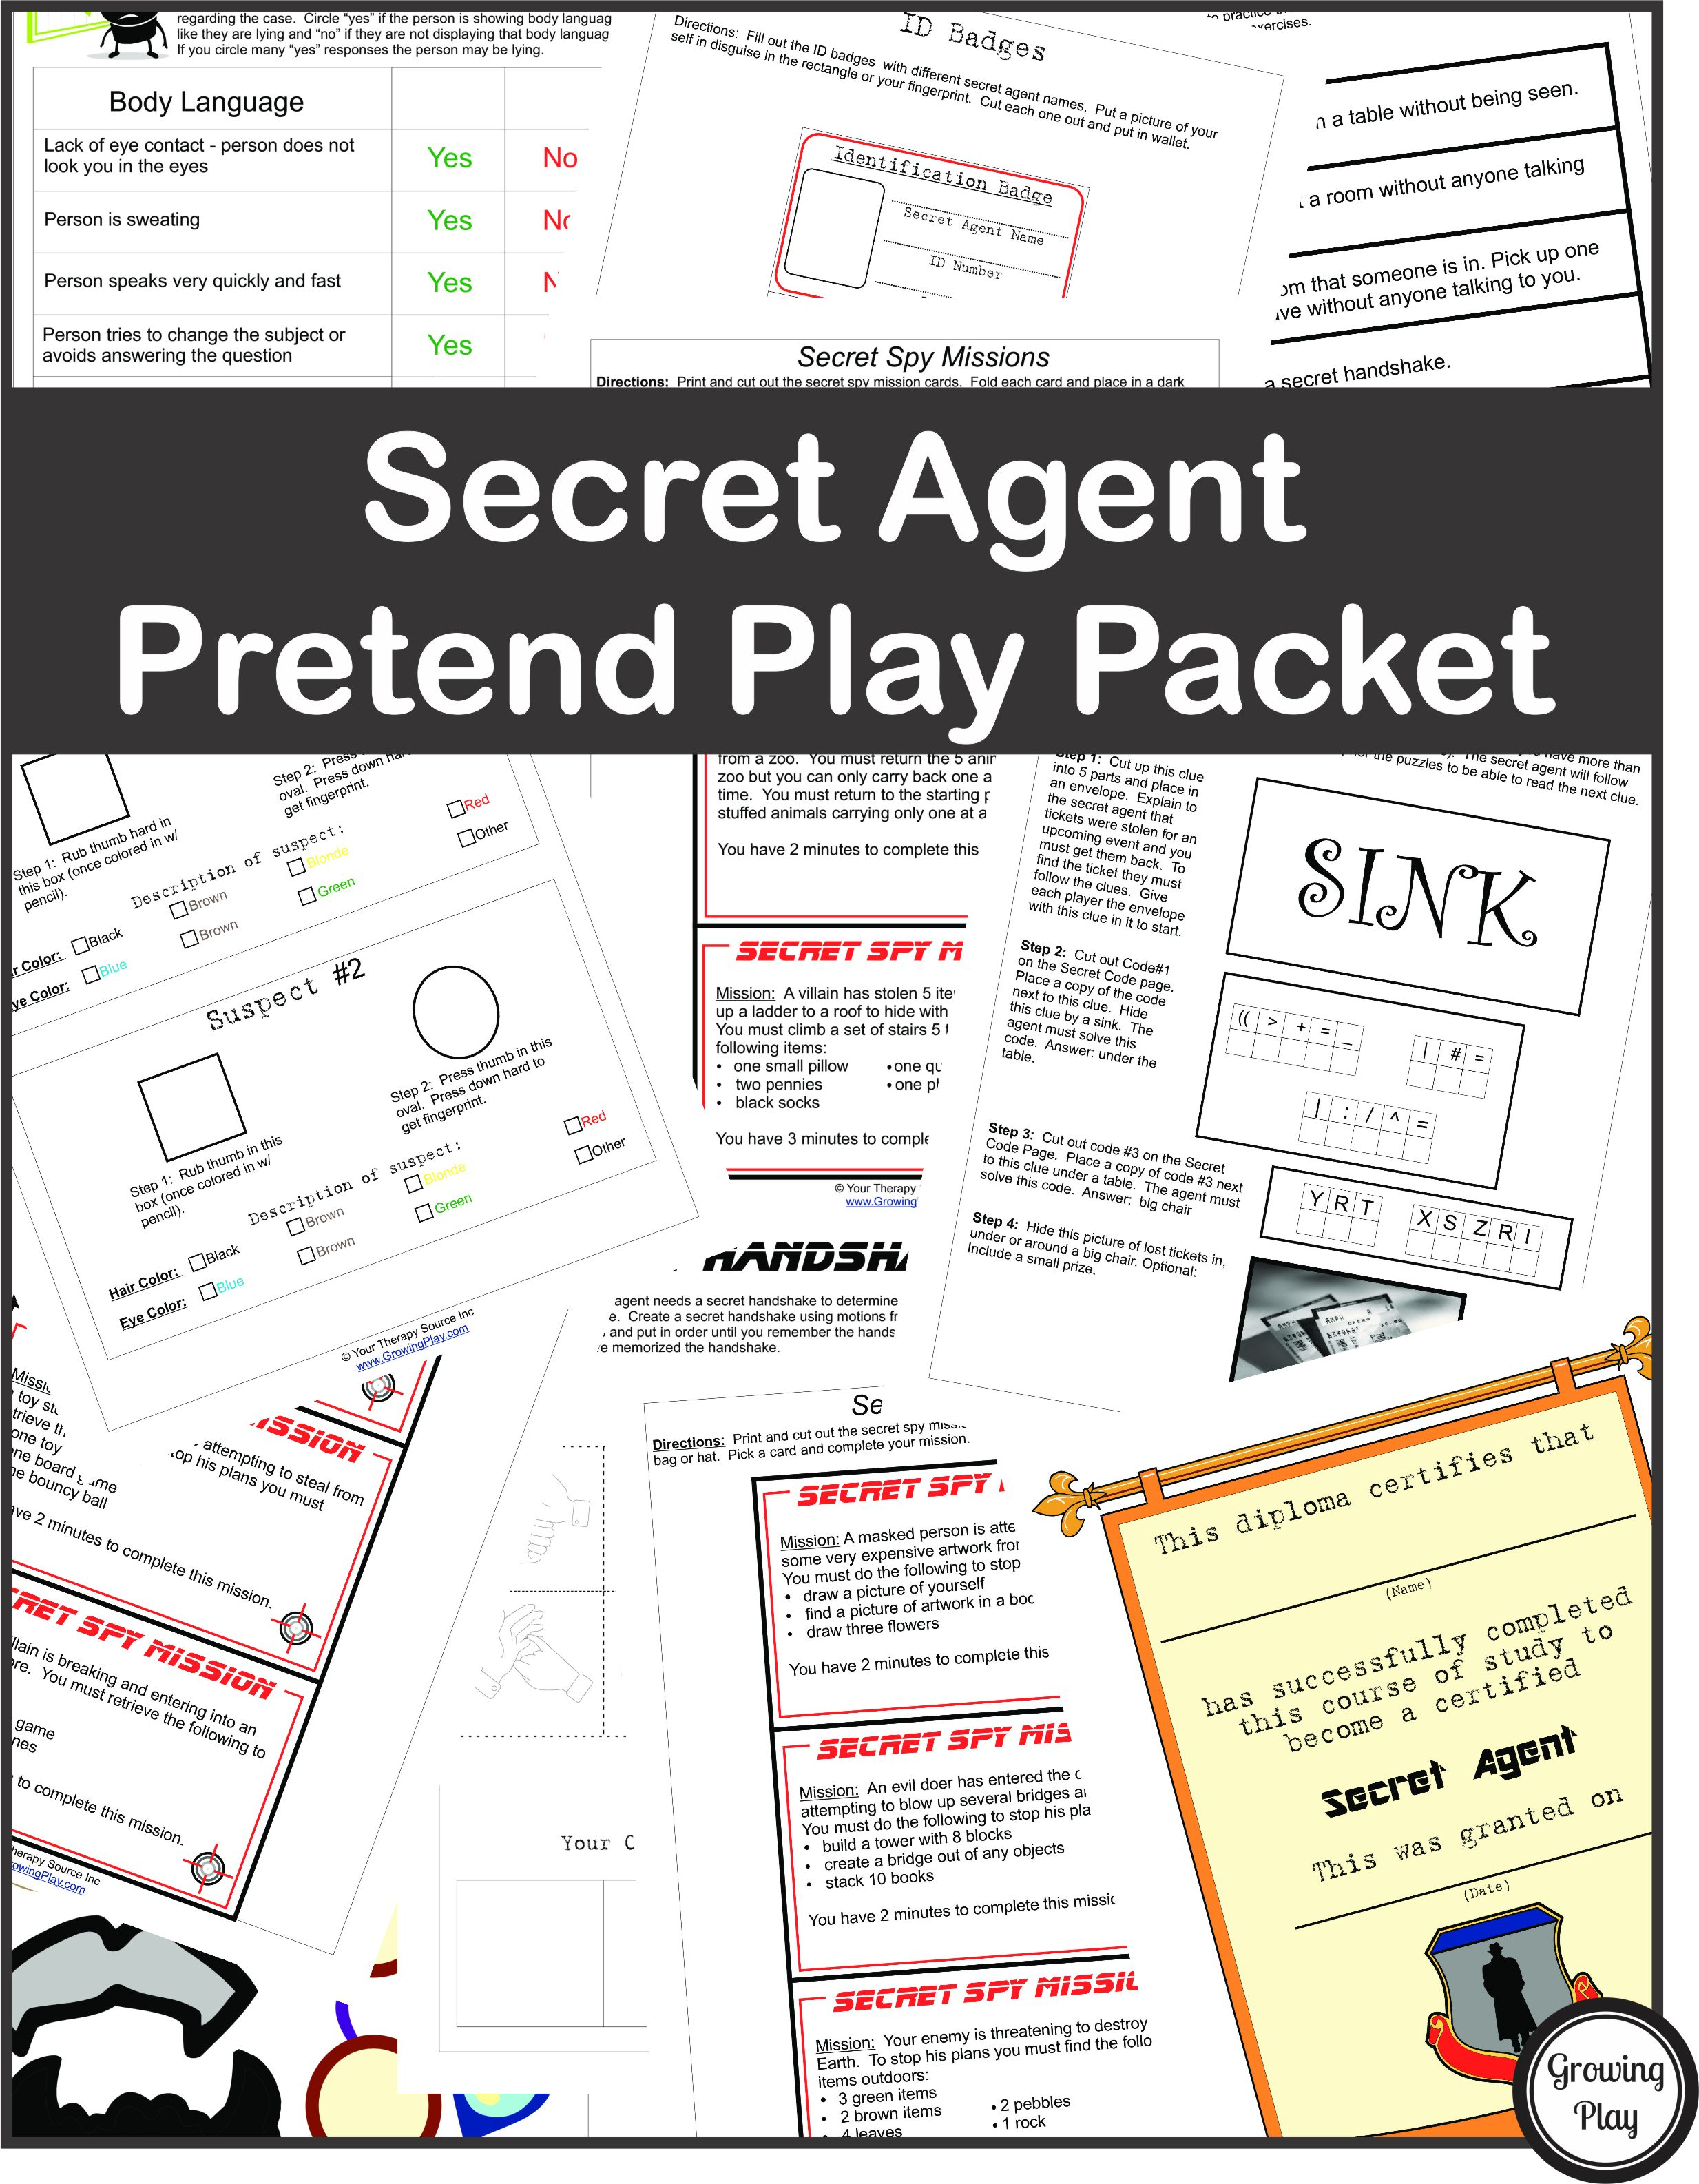 Secret Agent Pretend Play